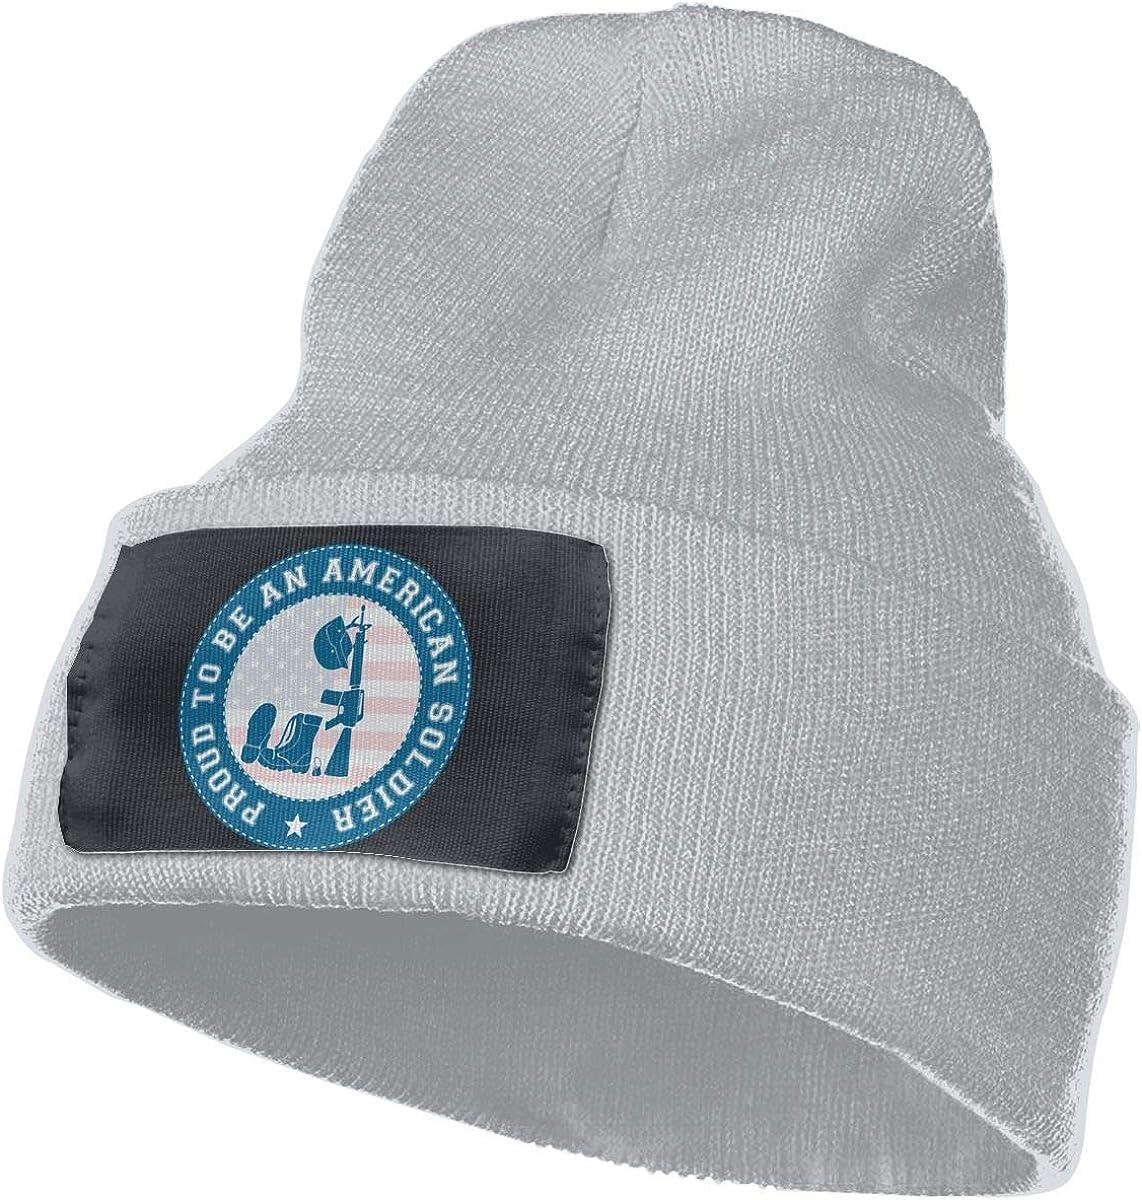 American Soldier Men /& Women Skull Caps Winter Warm Stretchy Knitting Beanie Hats